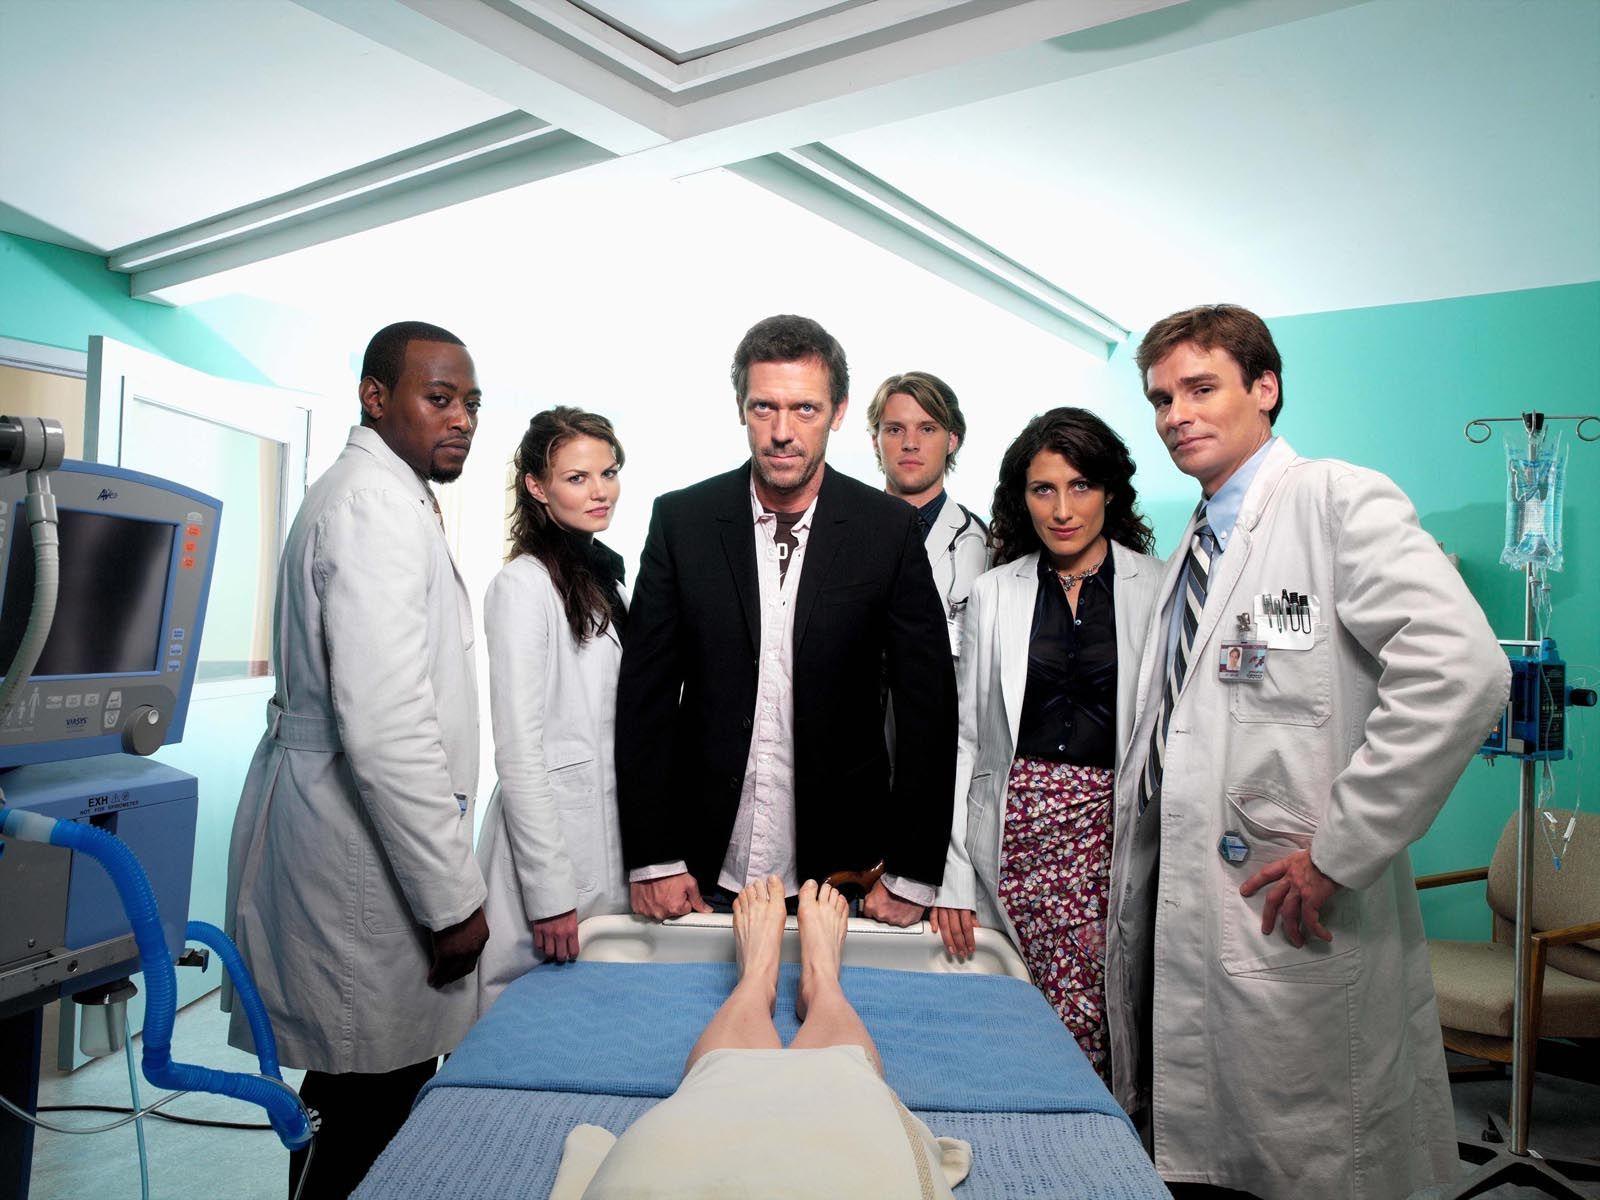 The original cast! (House, Hugh Laurie, Lisa Edelstein